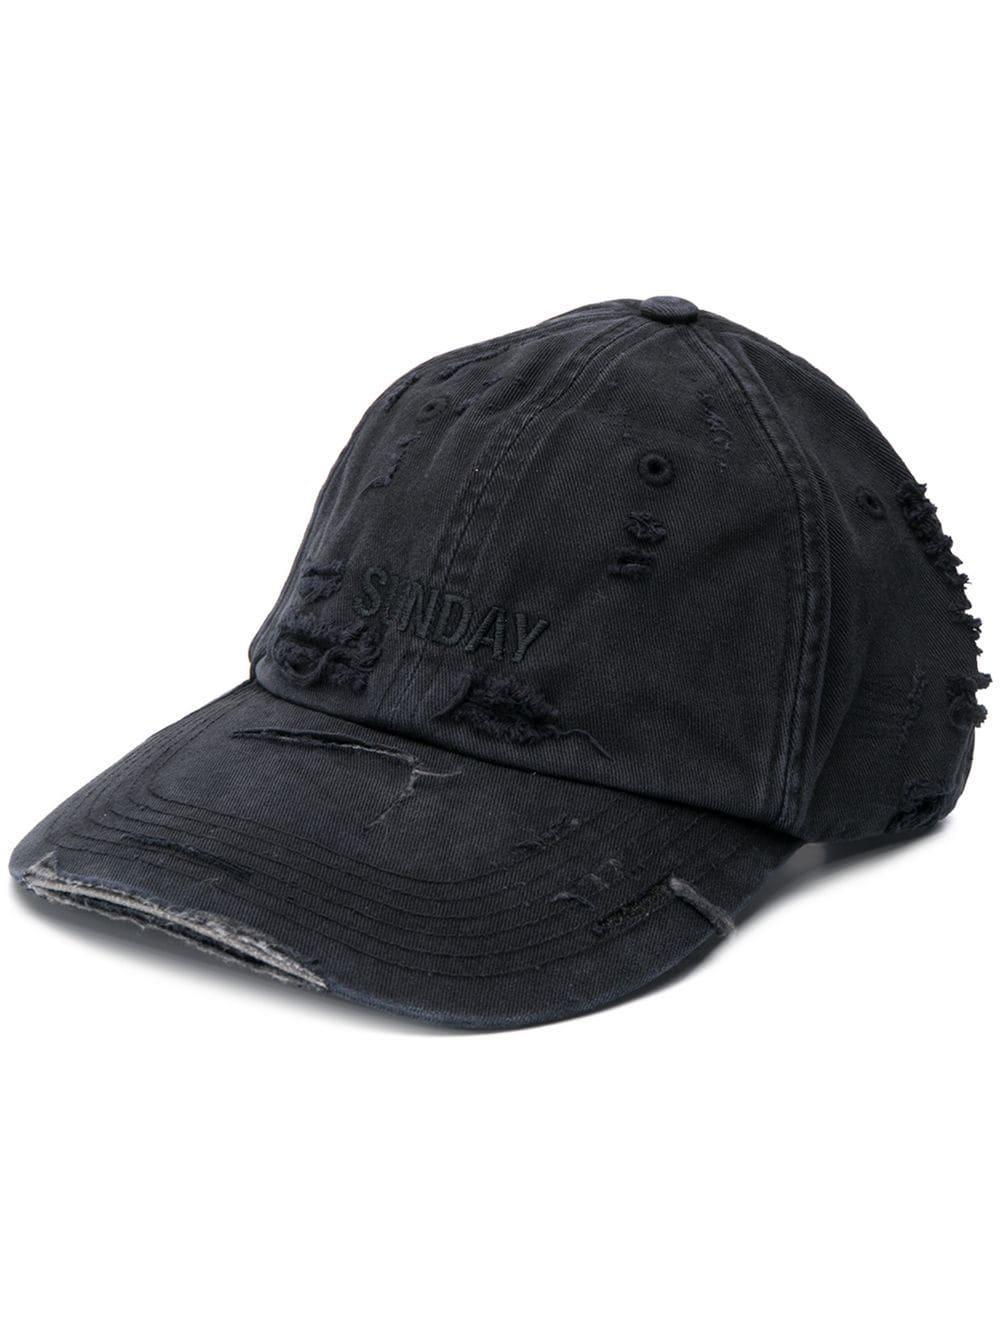 10d76bfa Vetements Friday Cotton Cap in Black - Lyst